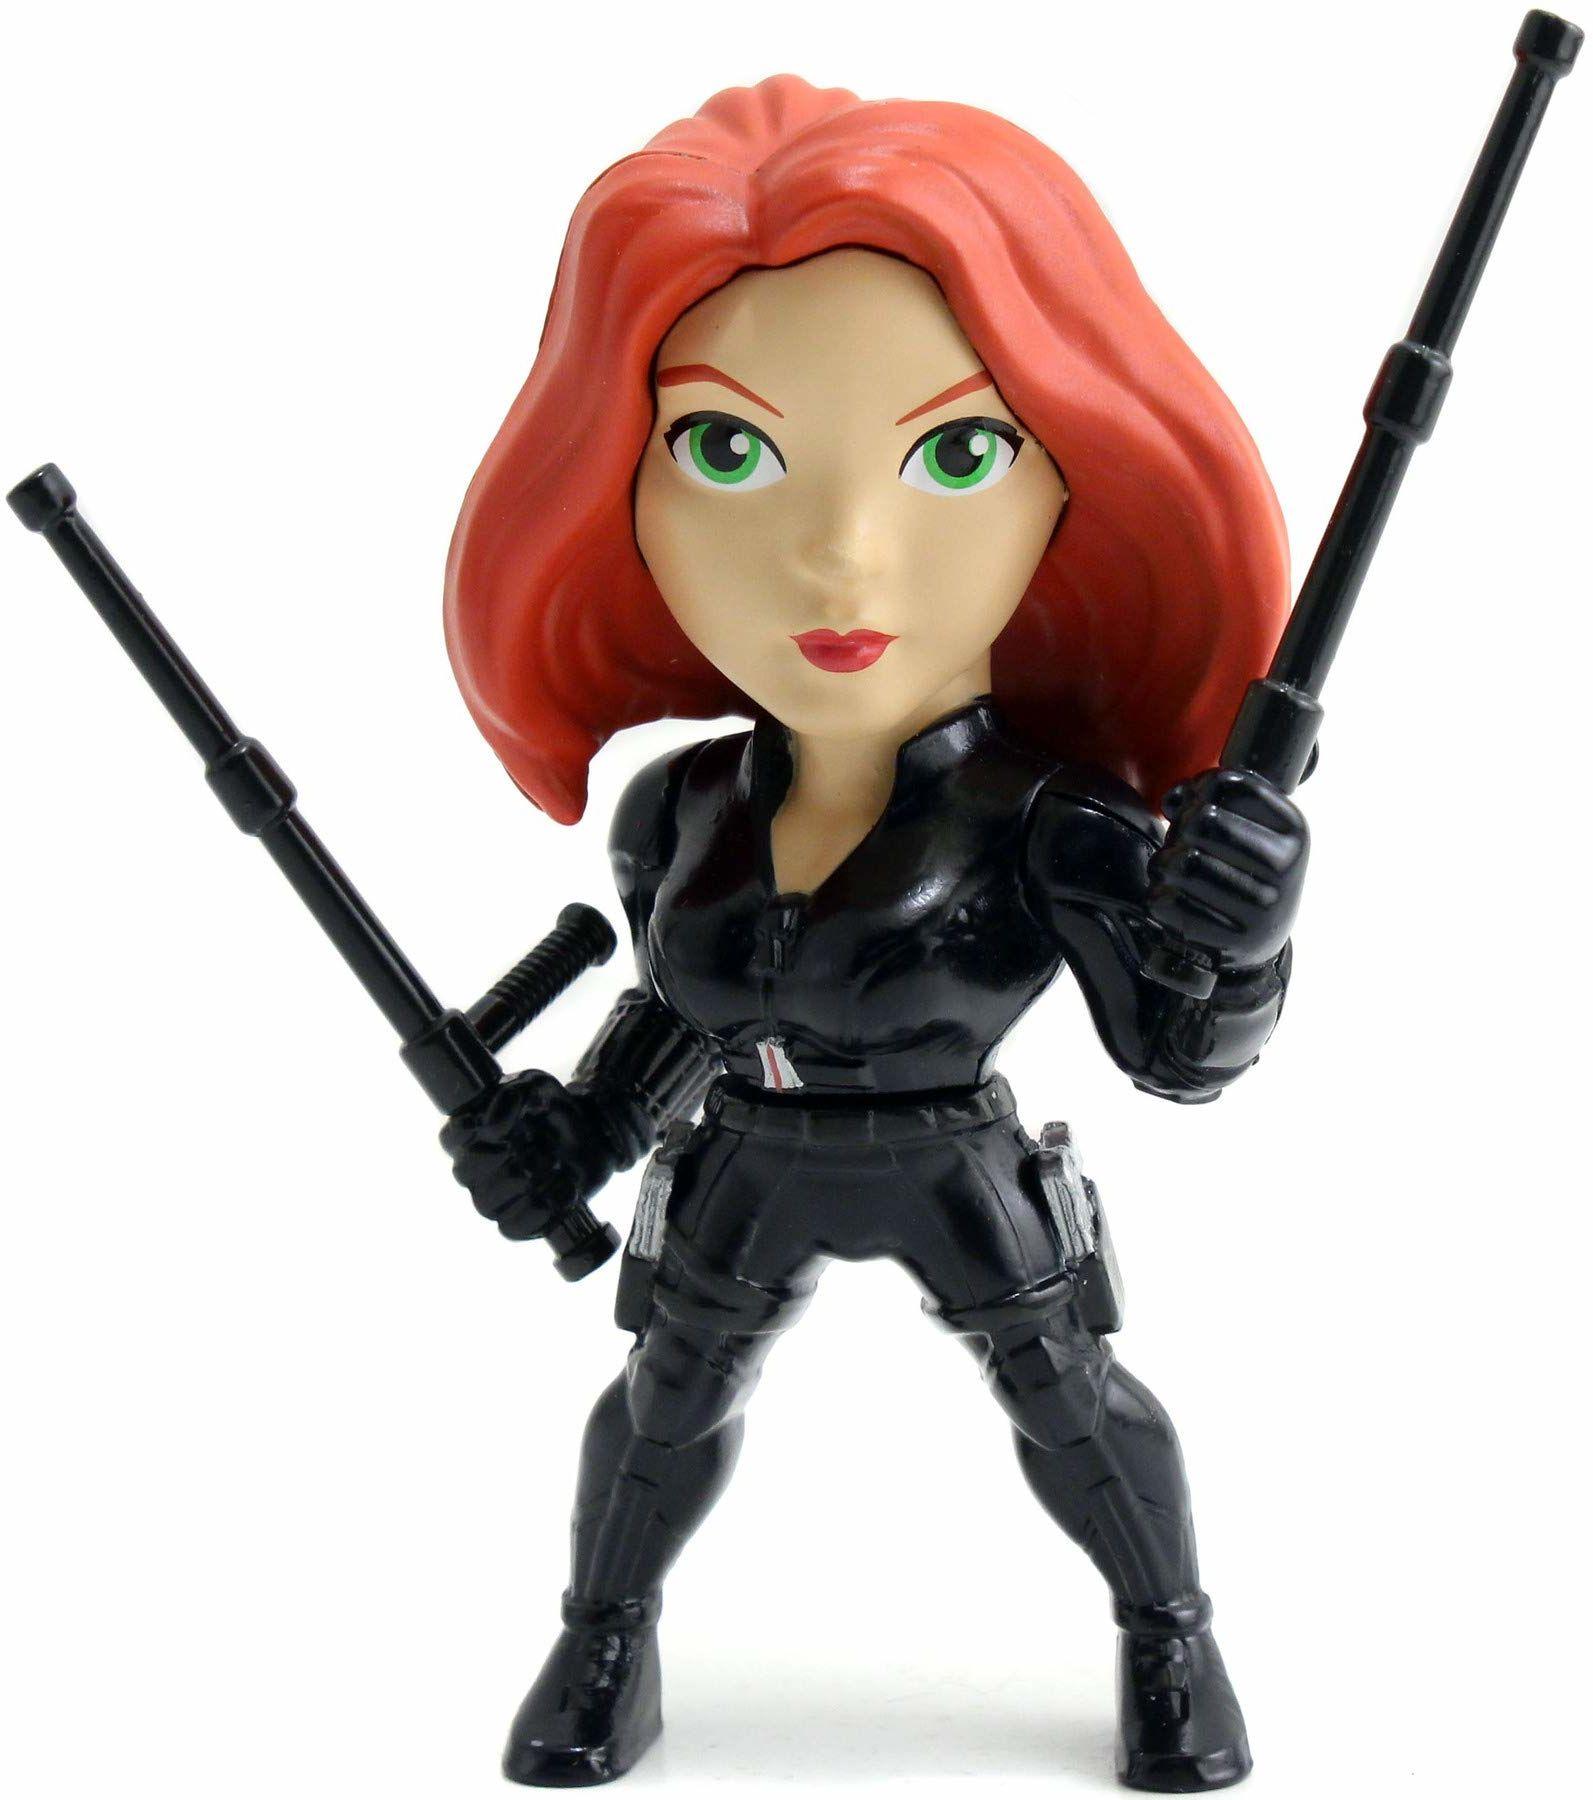 Jada Toys 253221014 Marvel Black Widow Figur, Die-cast, figurka kolekcjonerska, 10 cm, czarna